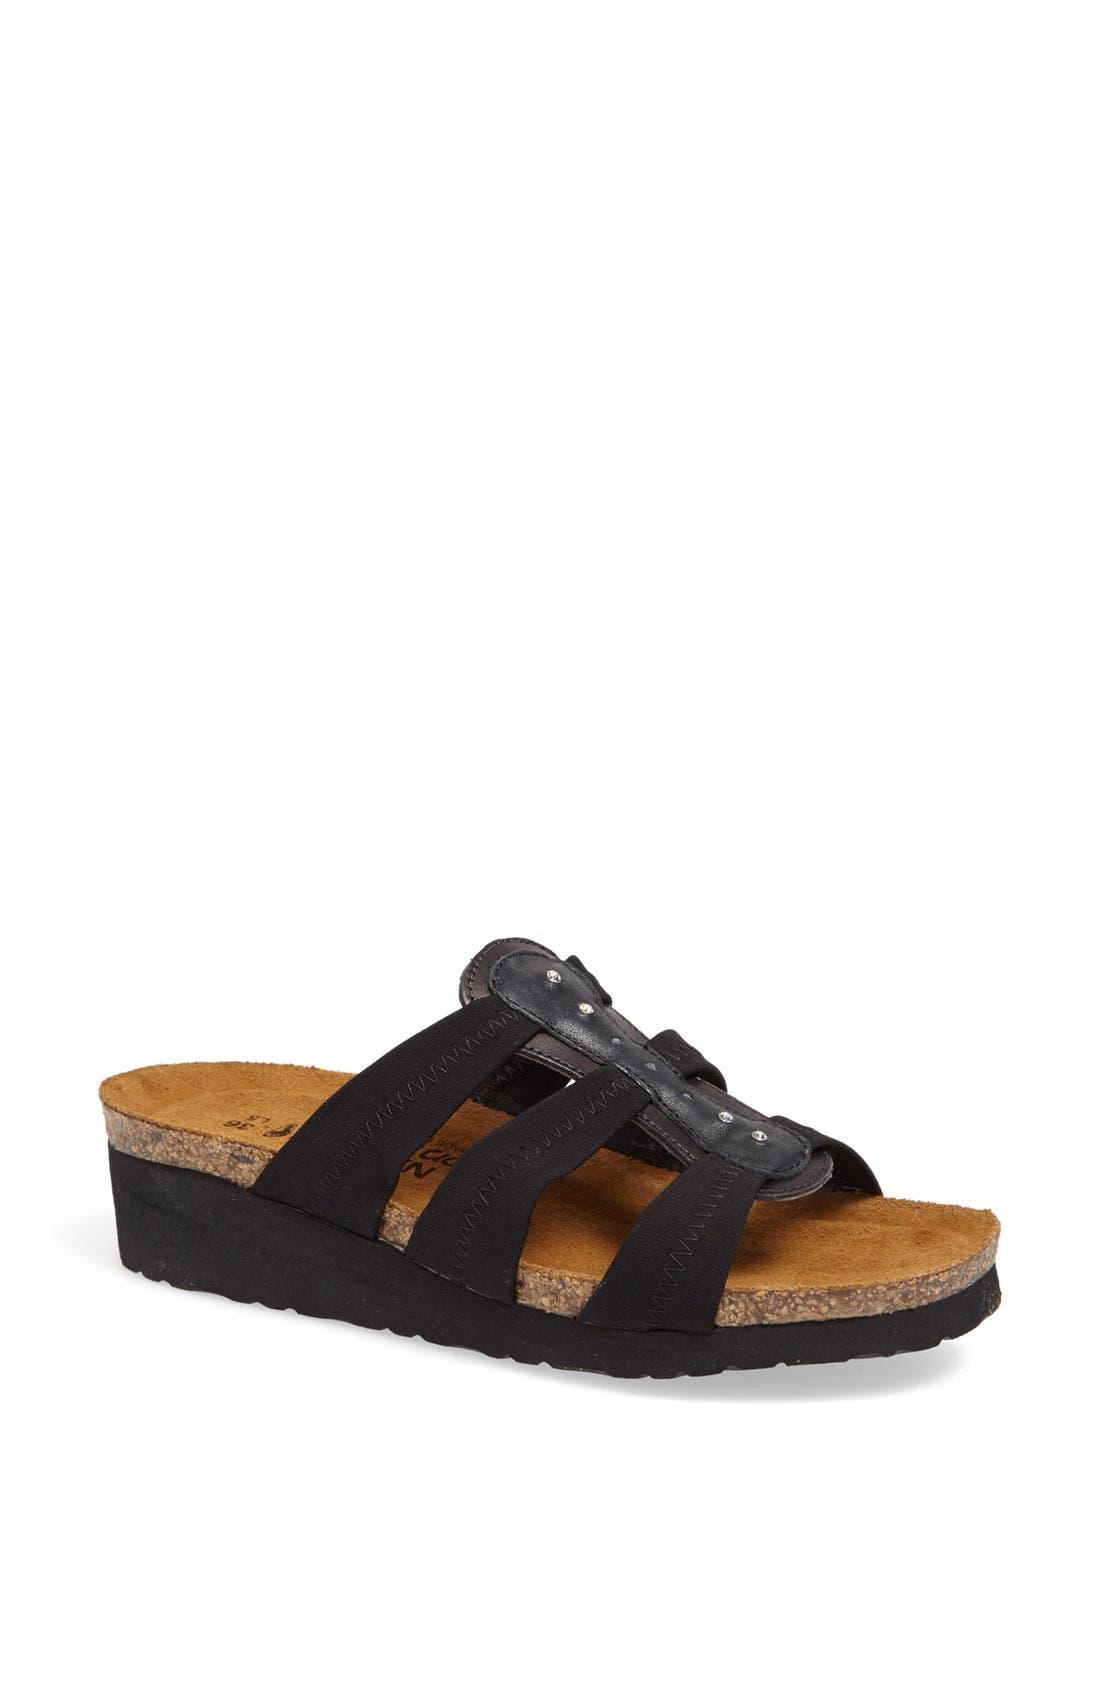 Main Image - Naot 'Brooke' Sandal